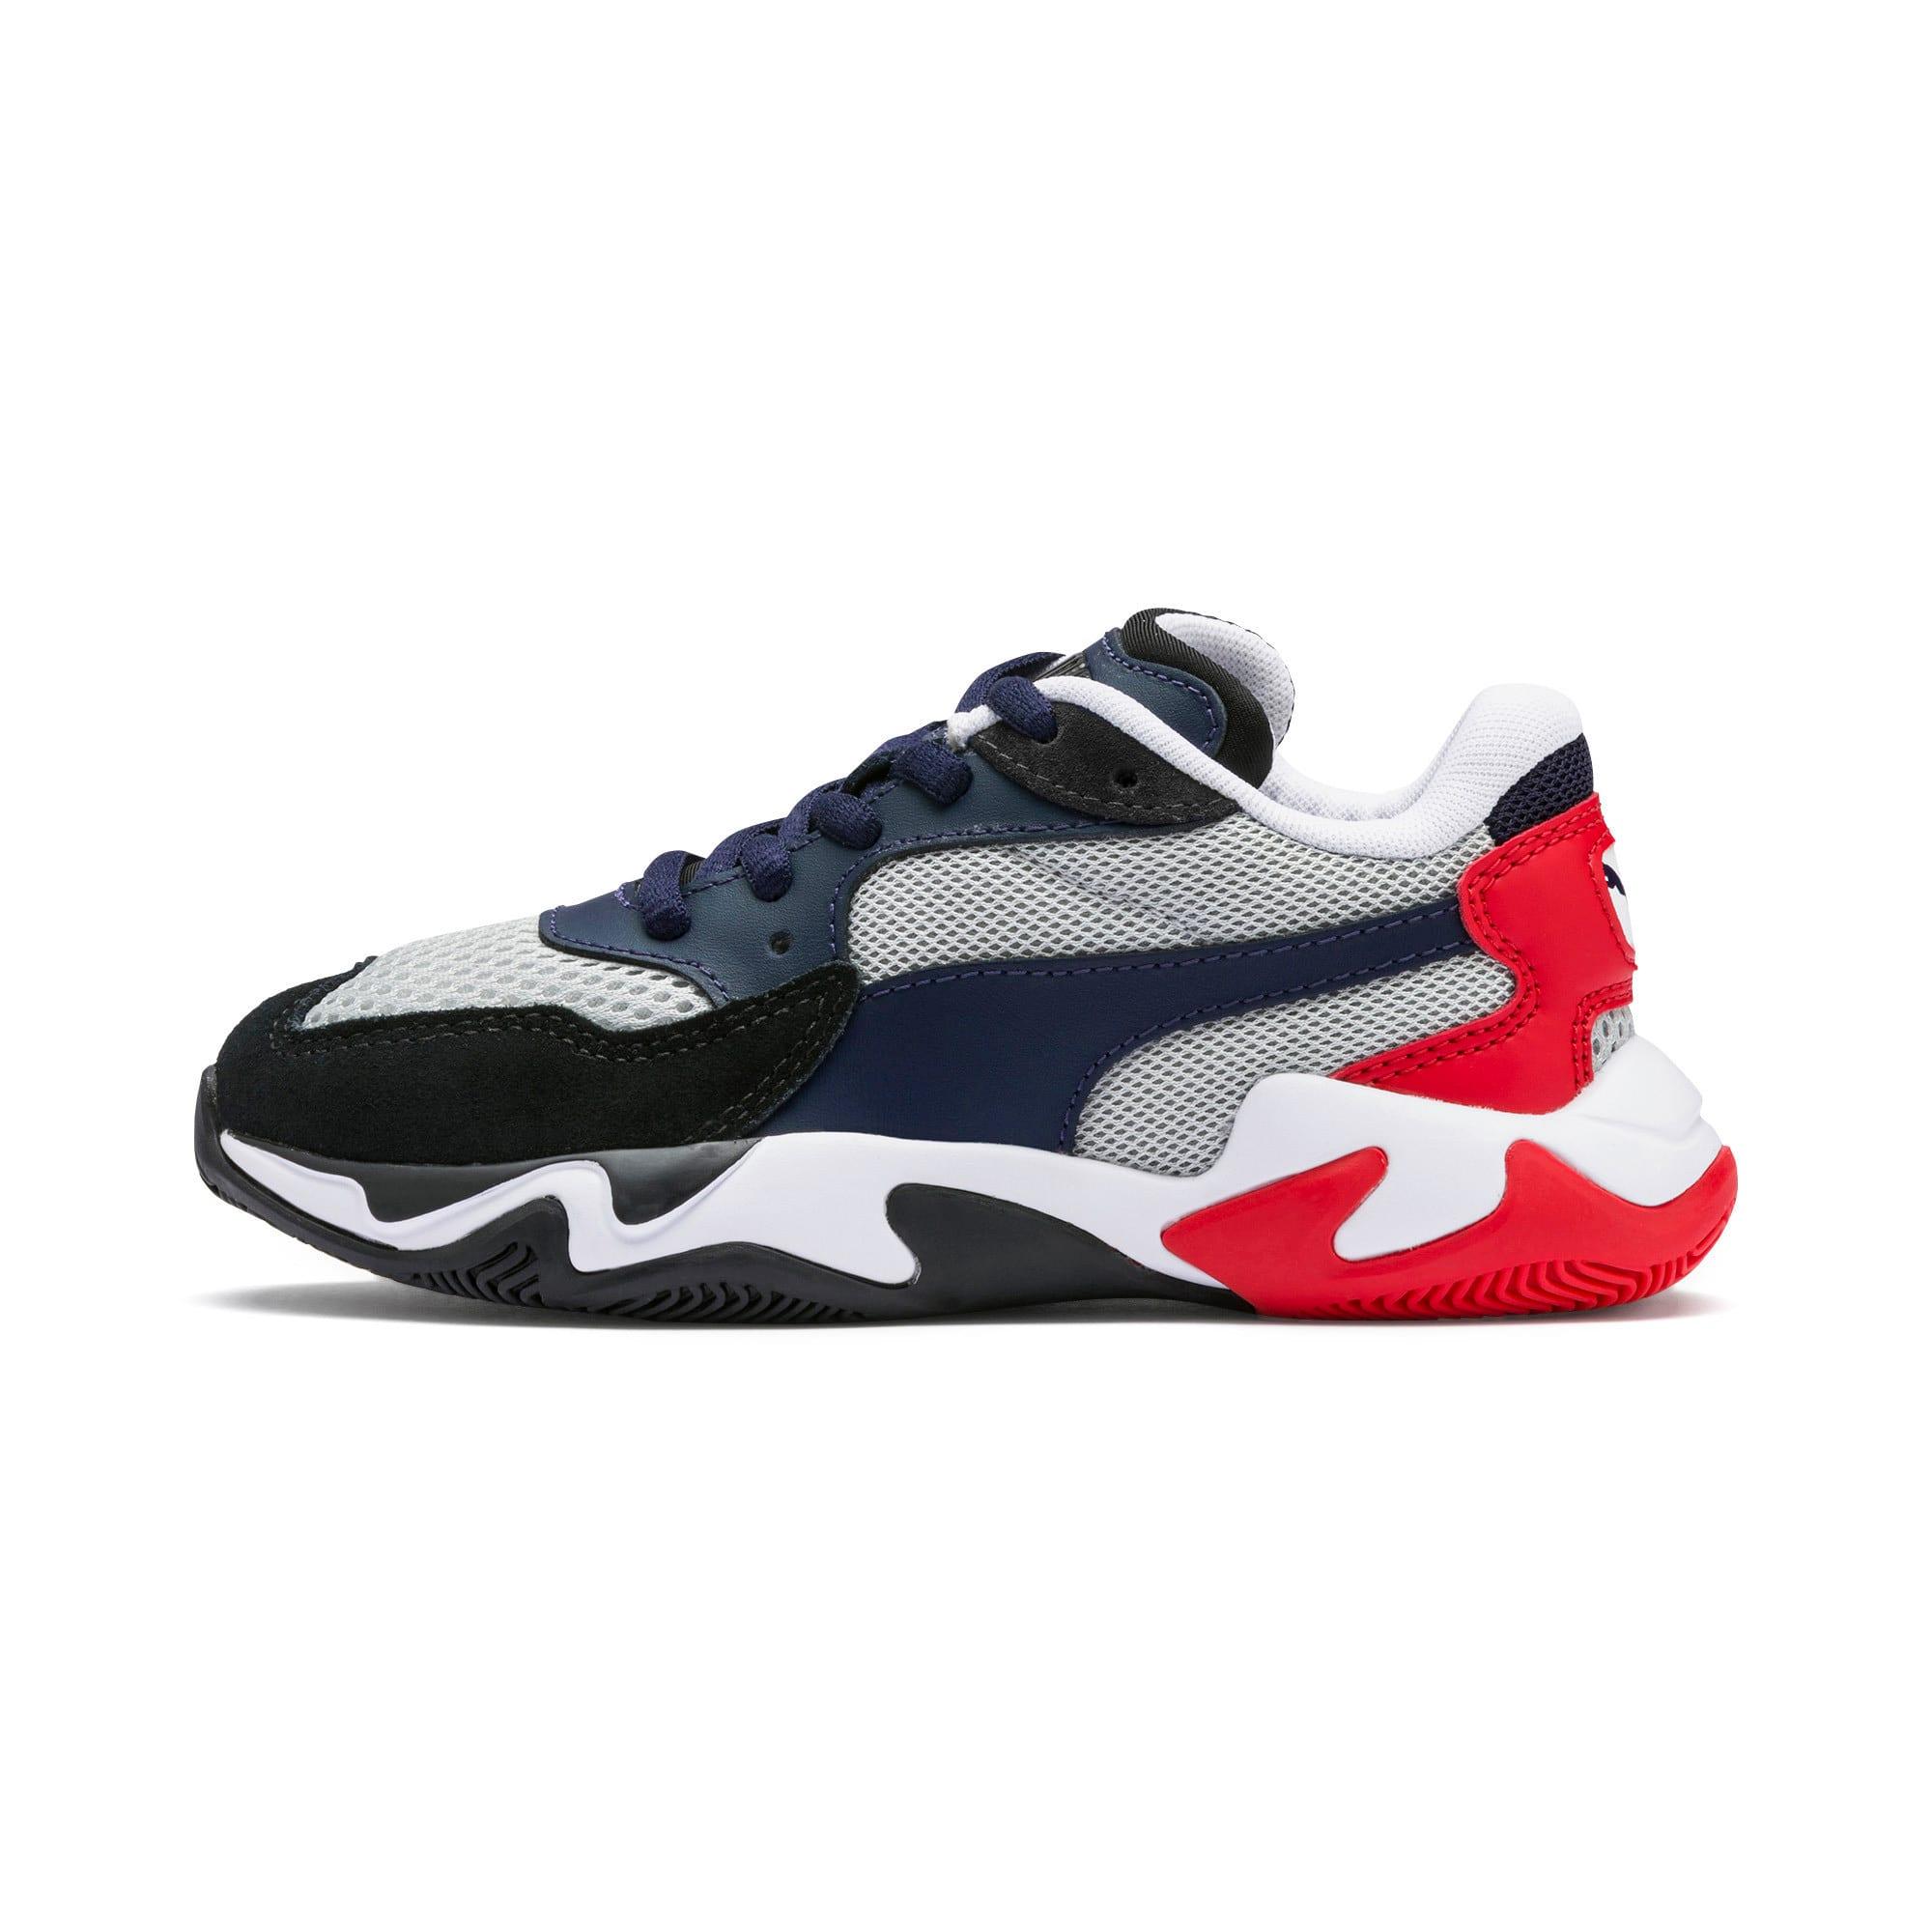 Imagen en miniatura 1 de Zapatillas de niño Storm Origin, Puma Black-High Rise, mediana